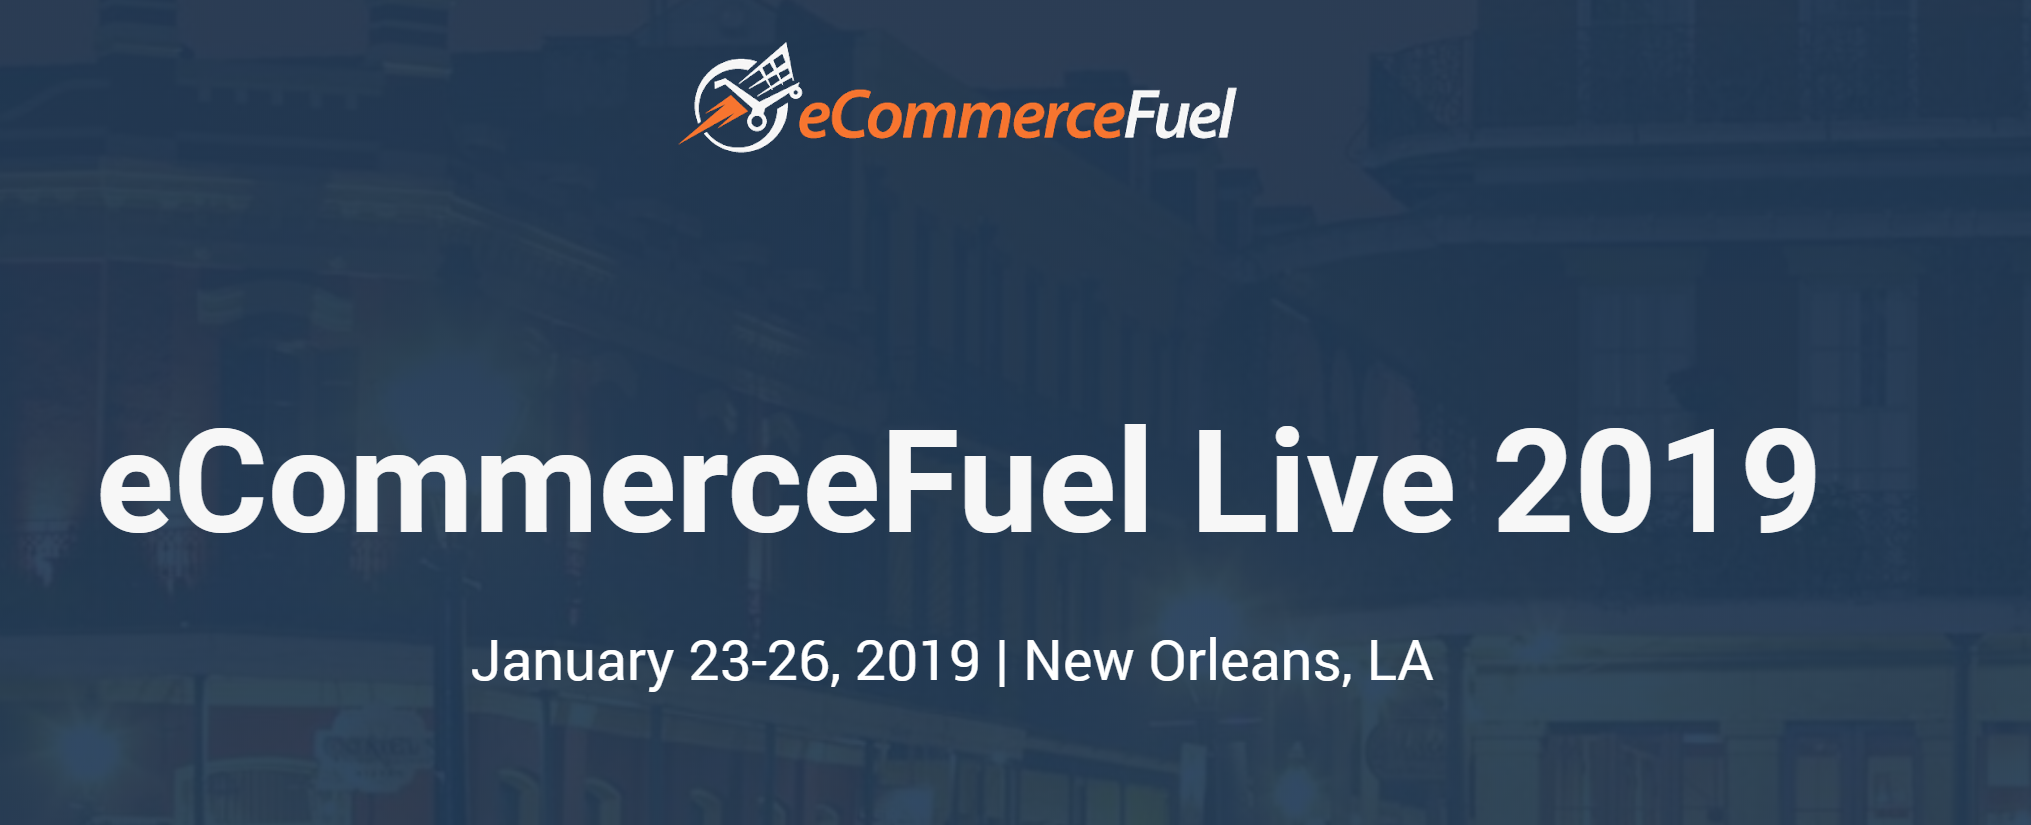 ecommerce fuel live 2019